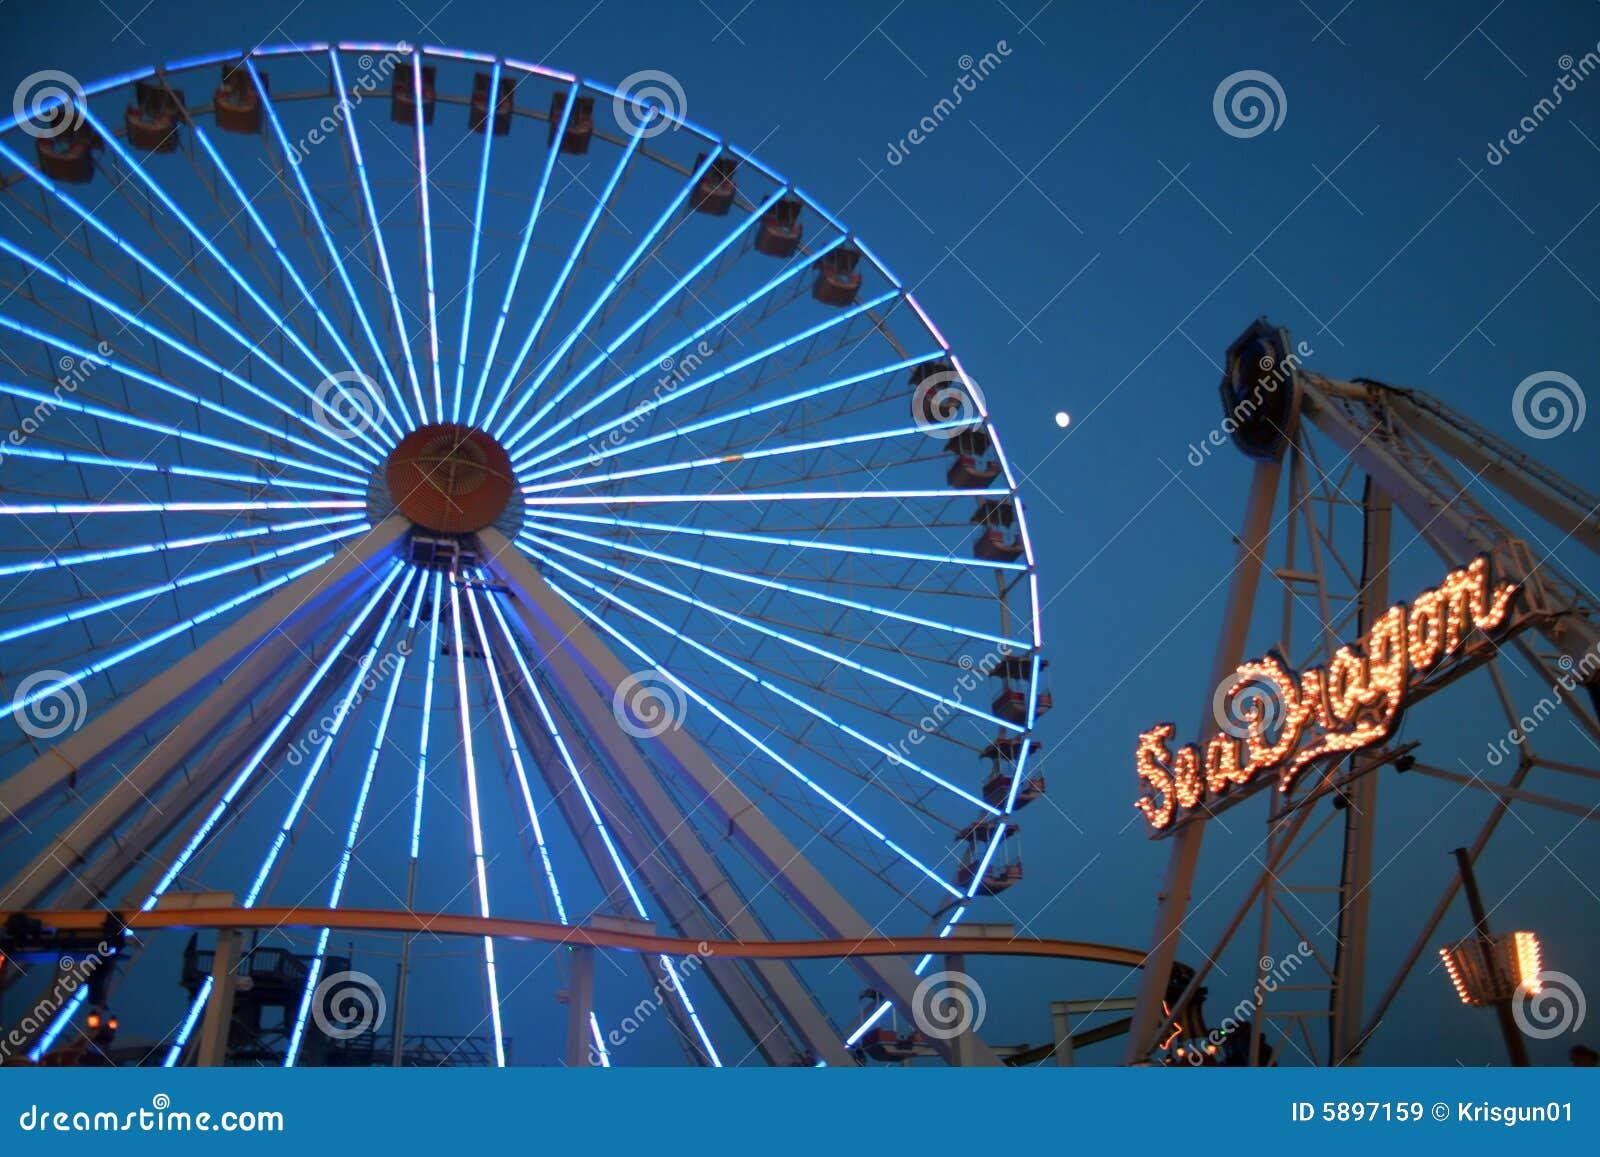 Wheels Up Pricing >> Carnival Rides At Night Royalty Free Stock Images - Image: 5897159